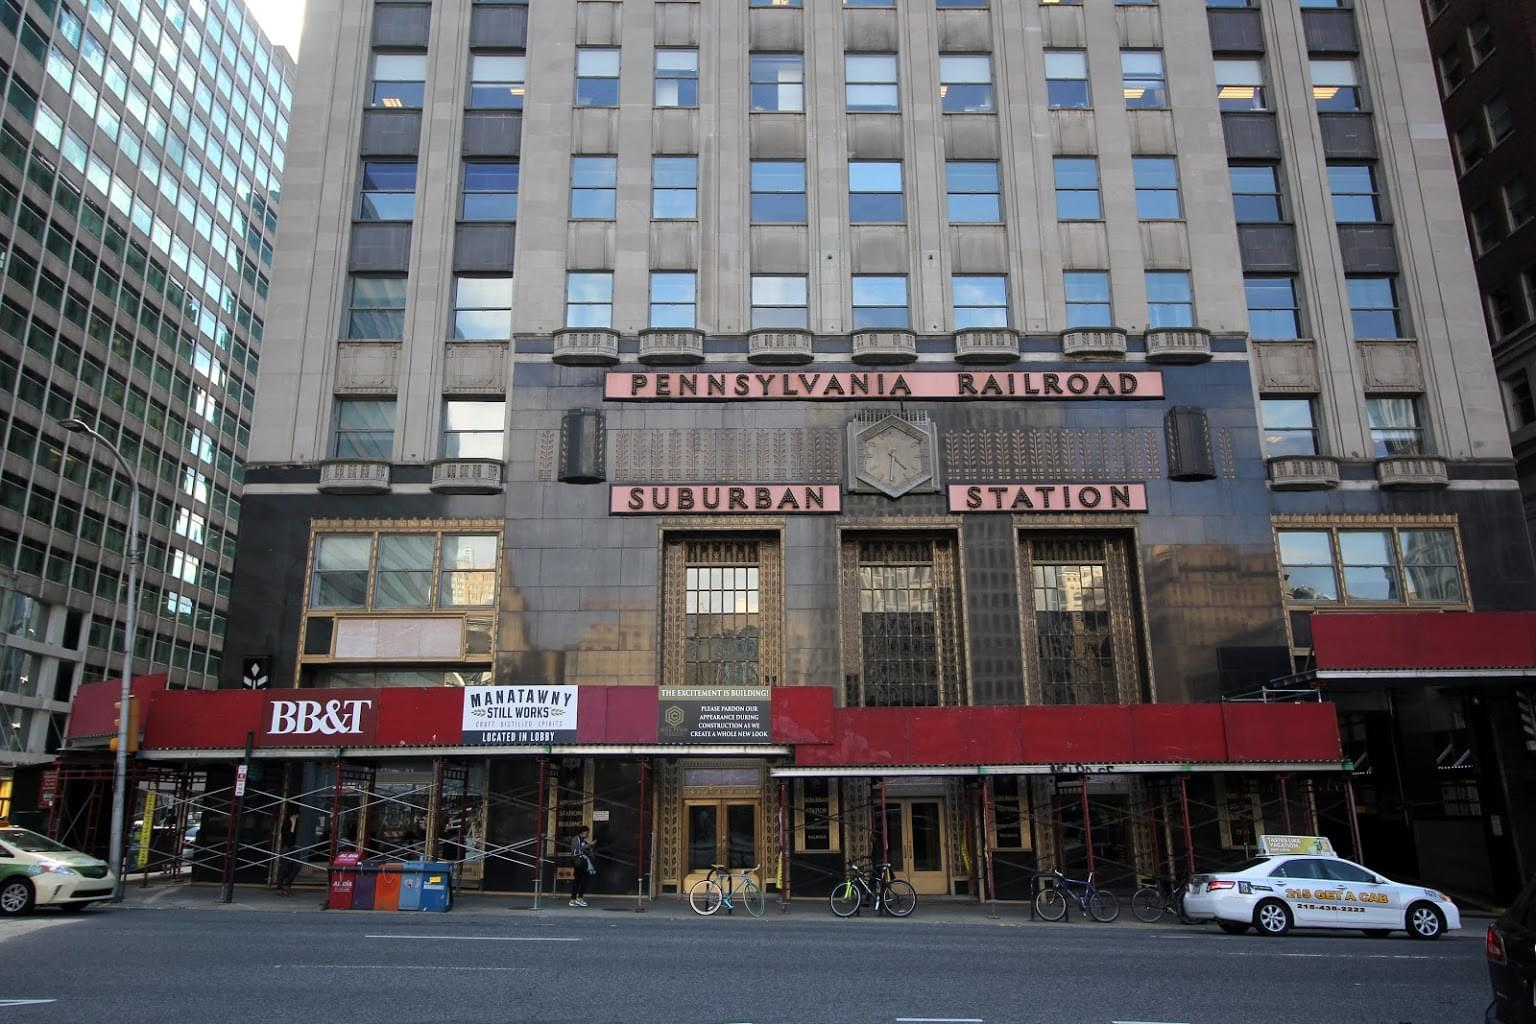 Suburban Station Shops, Retail Space Rental Agency in Philadelphia, PA exterior facade